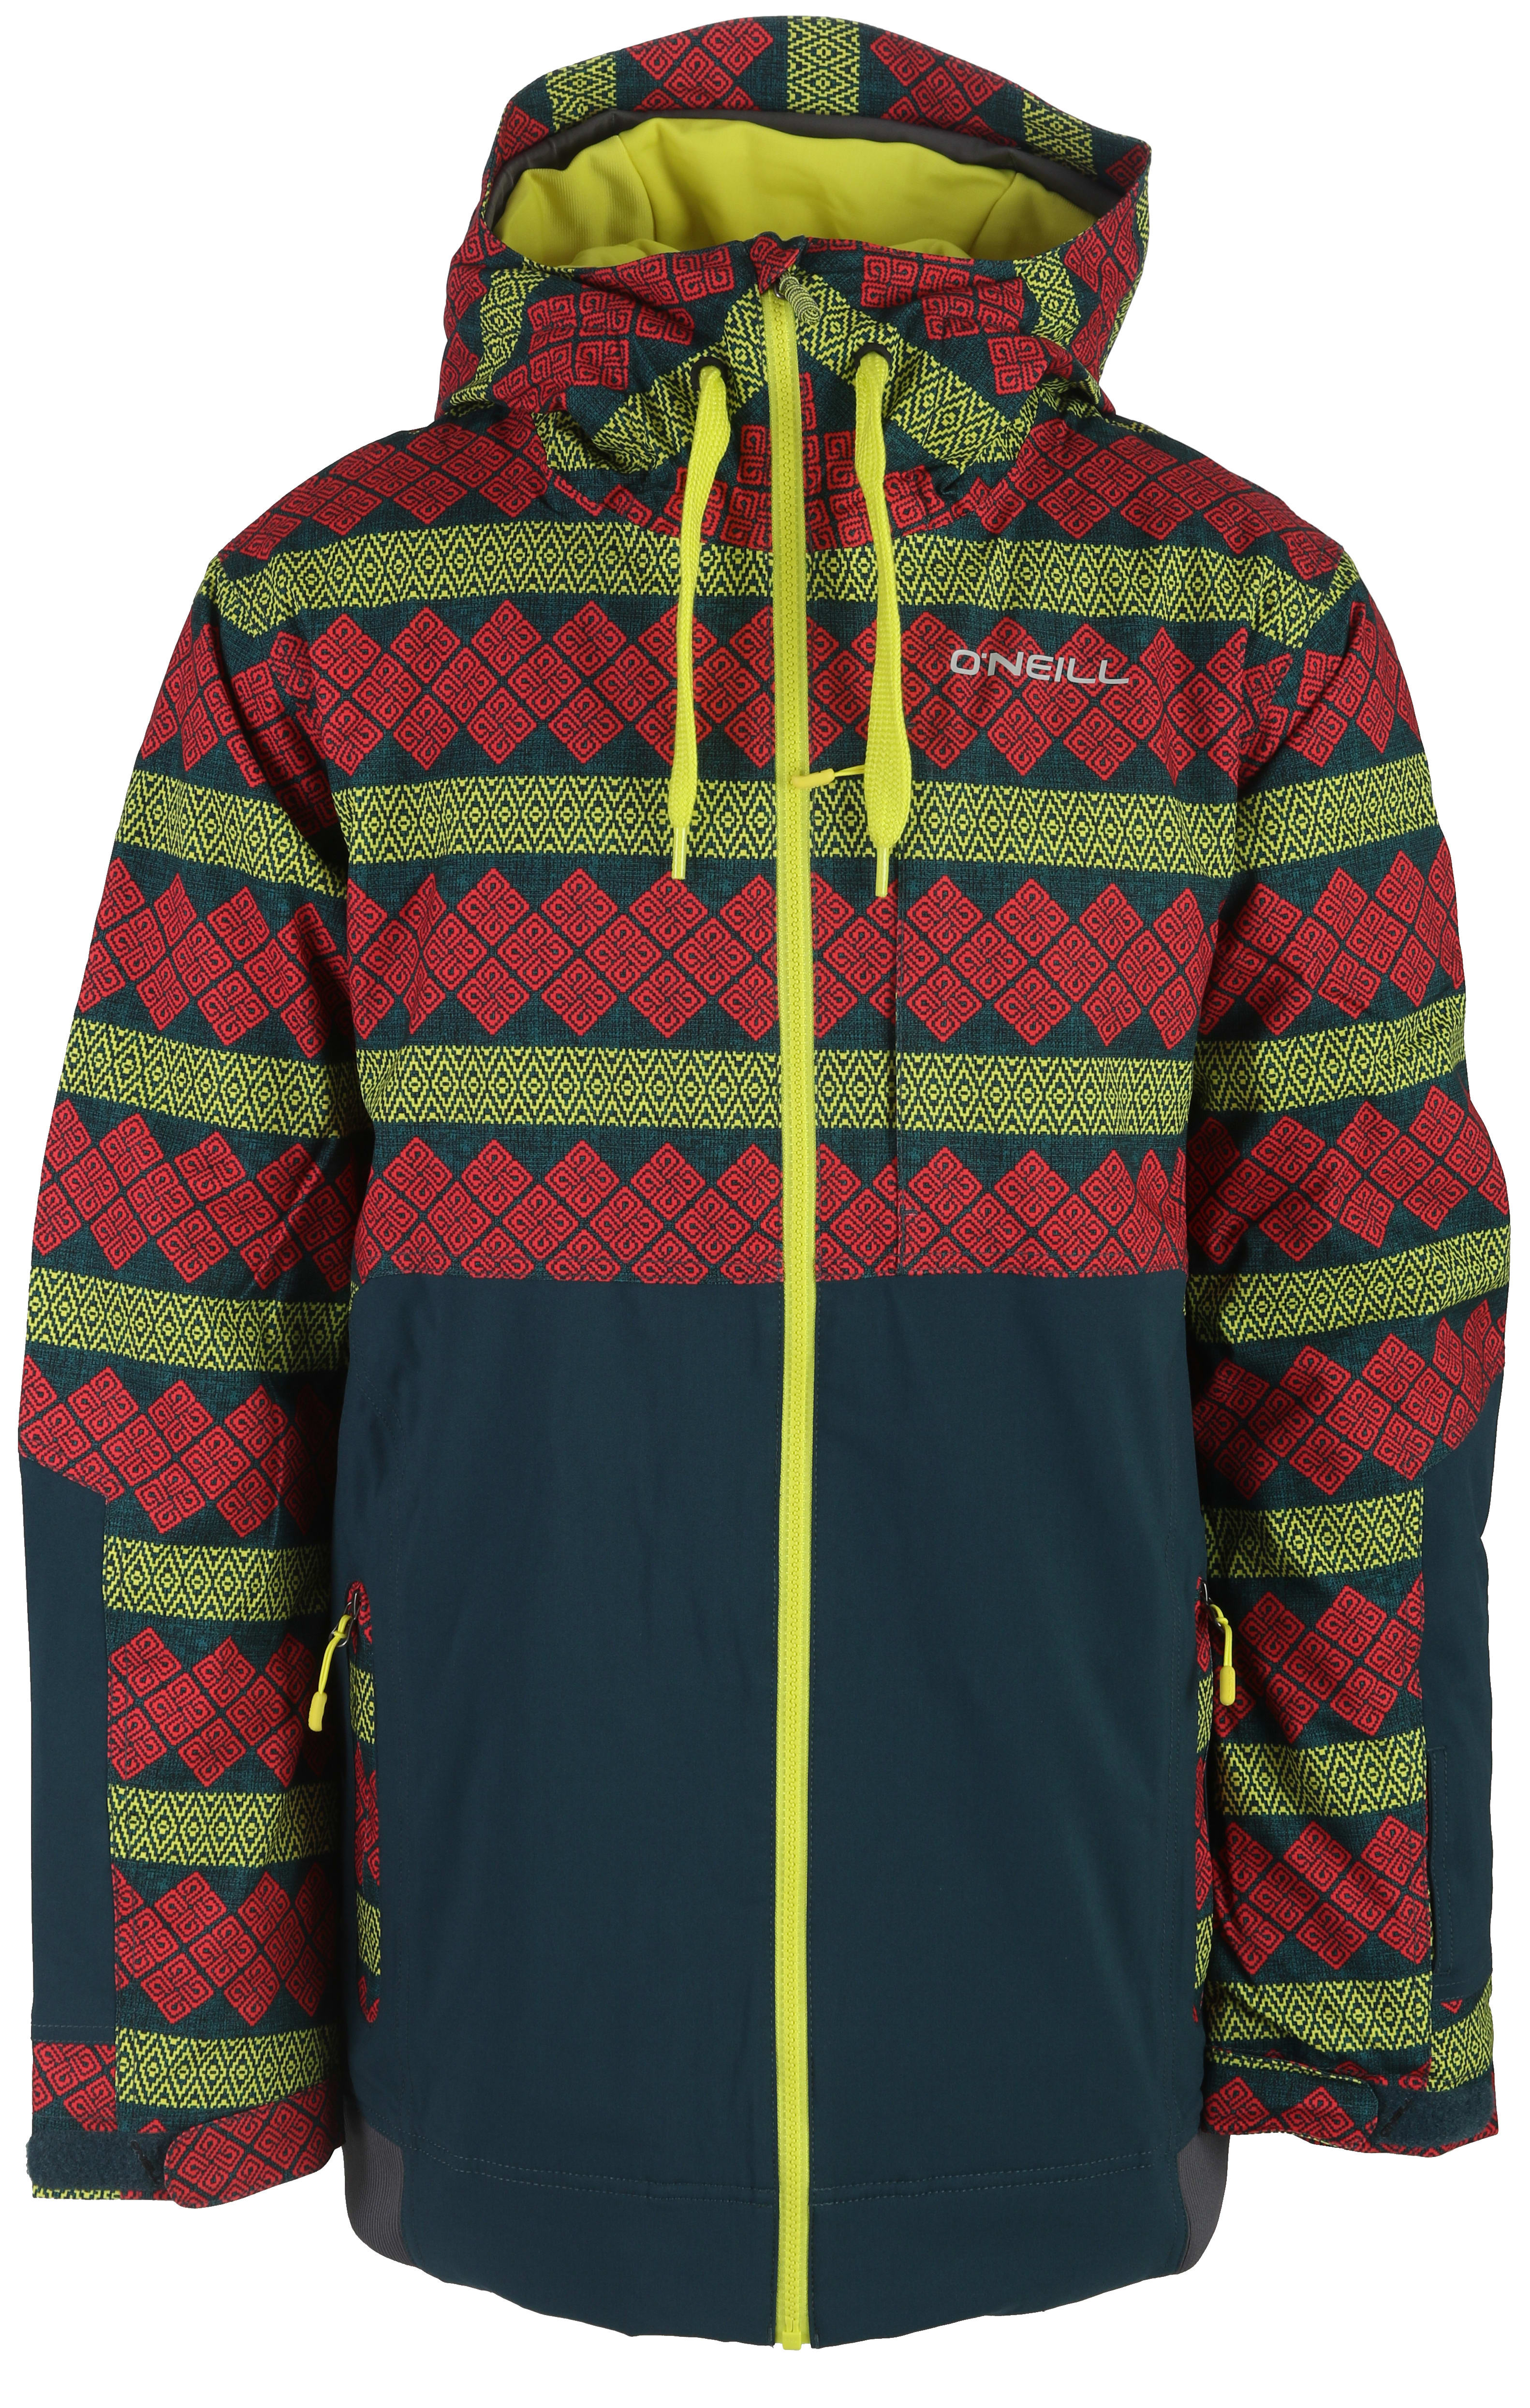 ONeill David Wise Snowboard Jacket - thumbnail 1 958666b47